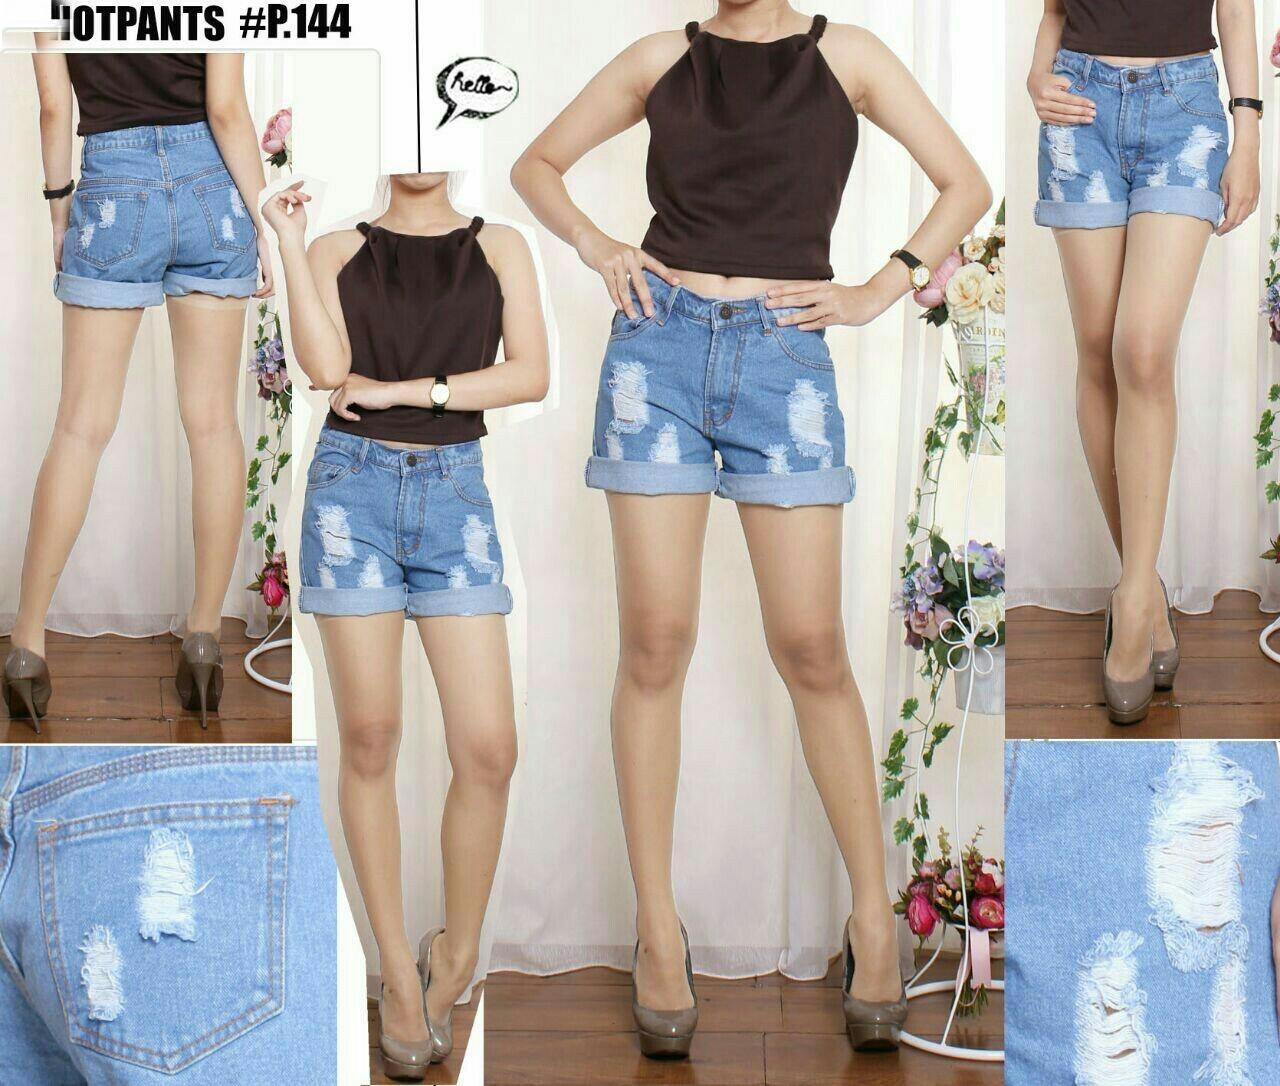 Jual Celana Pendek Hotpant Blue Jeans Ripped - 12925